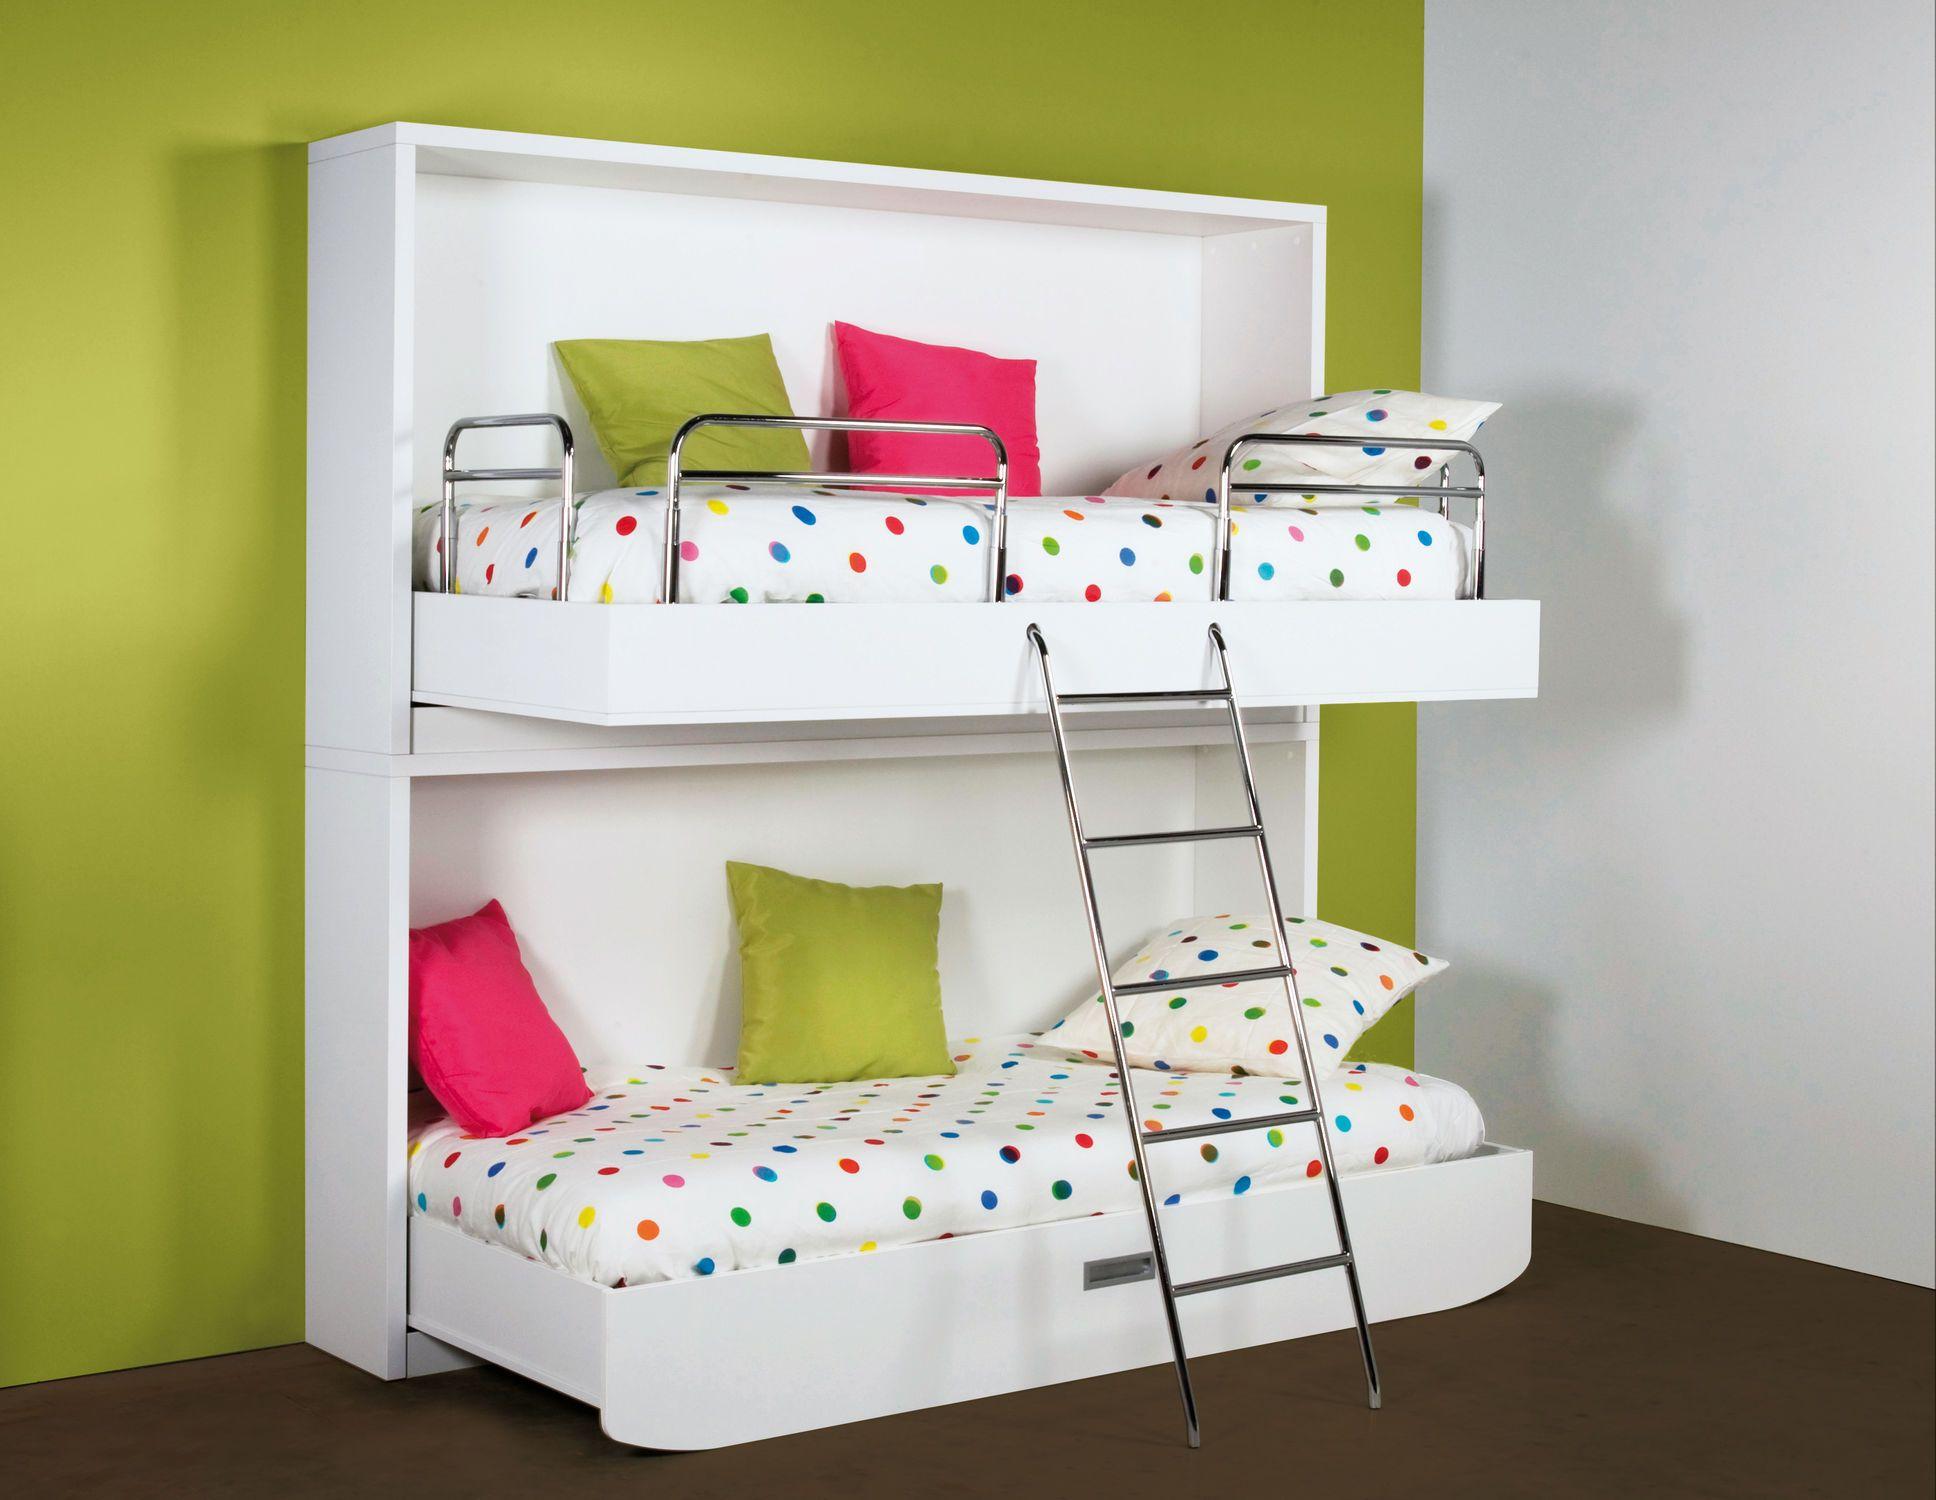 lits escamotables deco chambres enfants. Black Bedroom Furniture Sets. Home Design Ideas